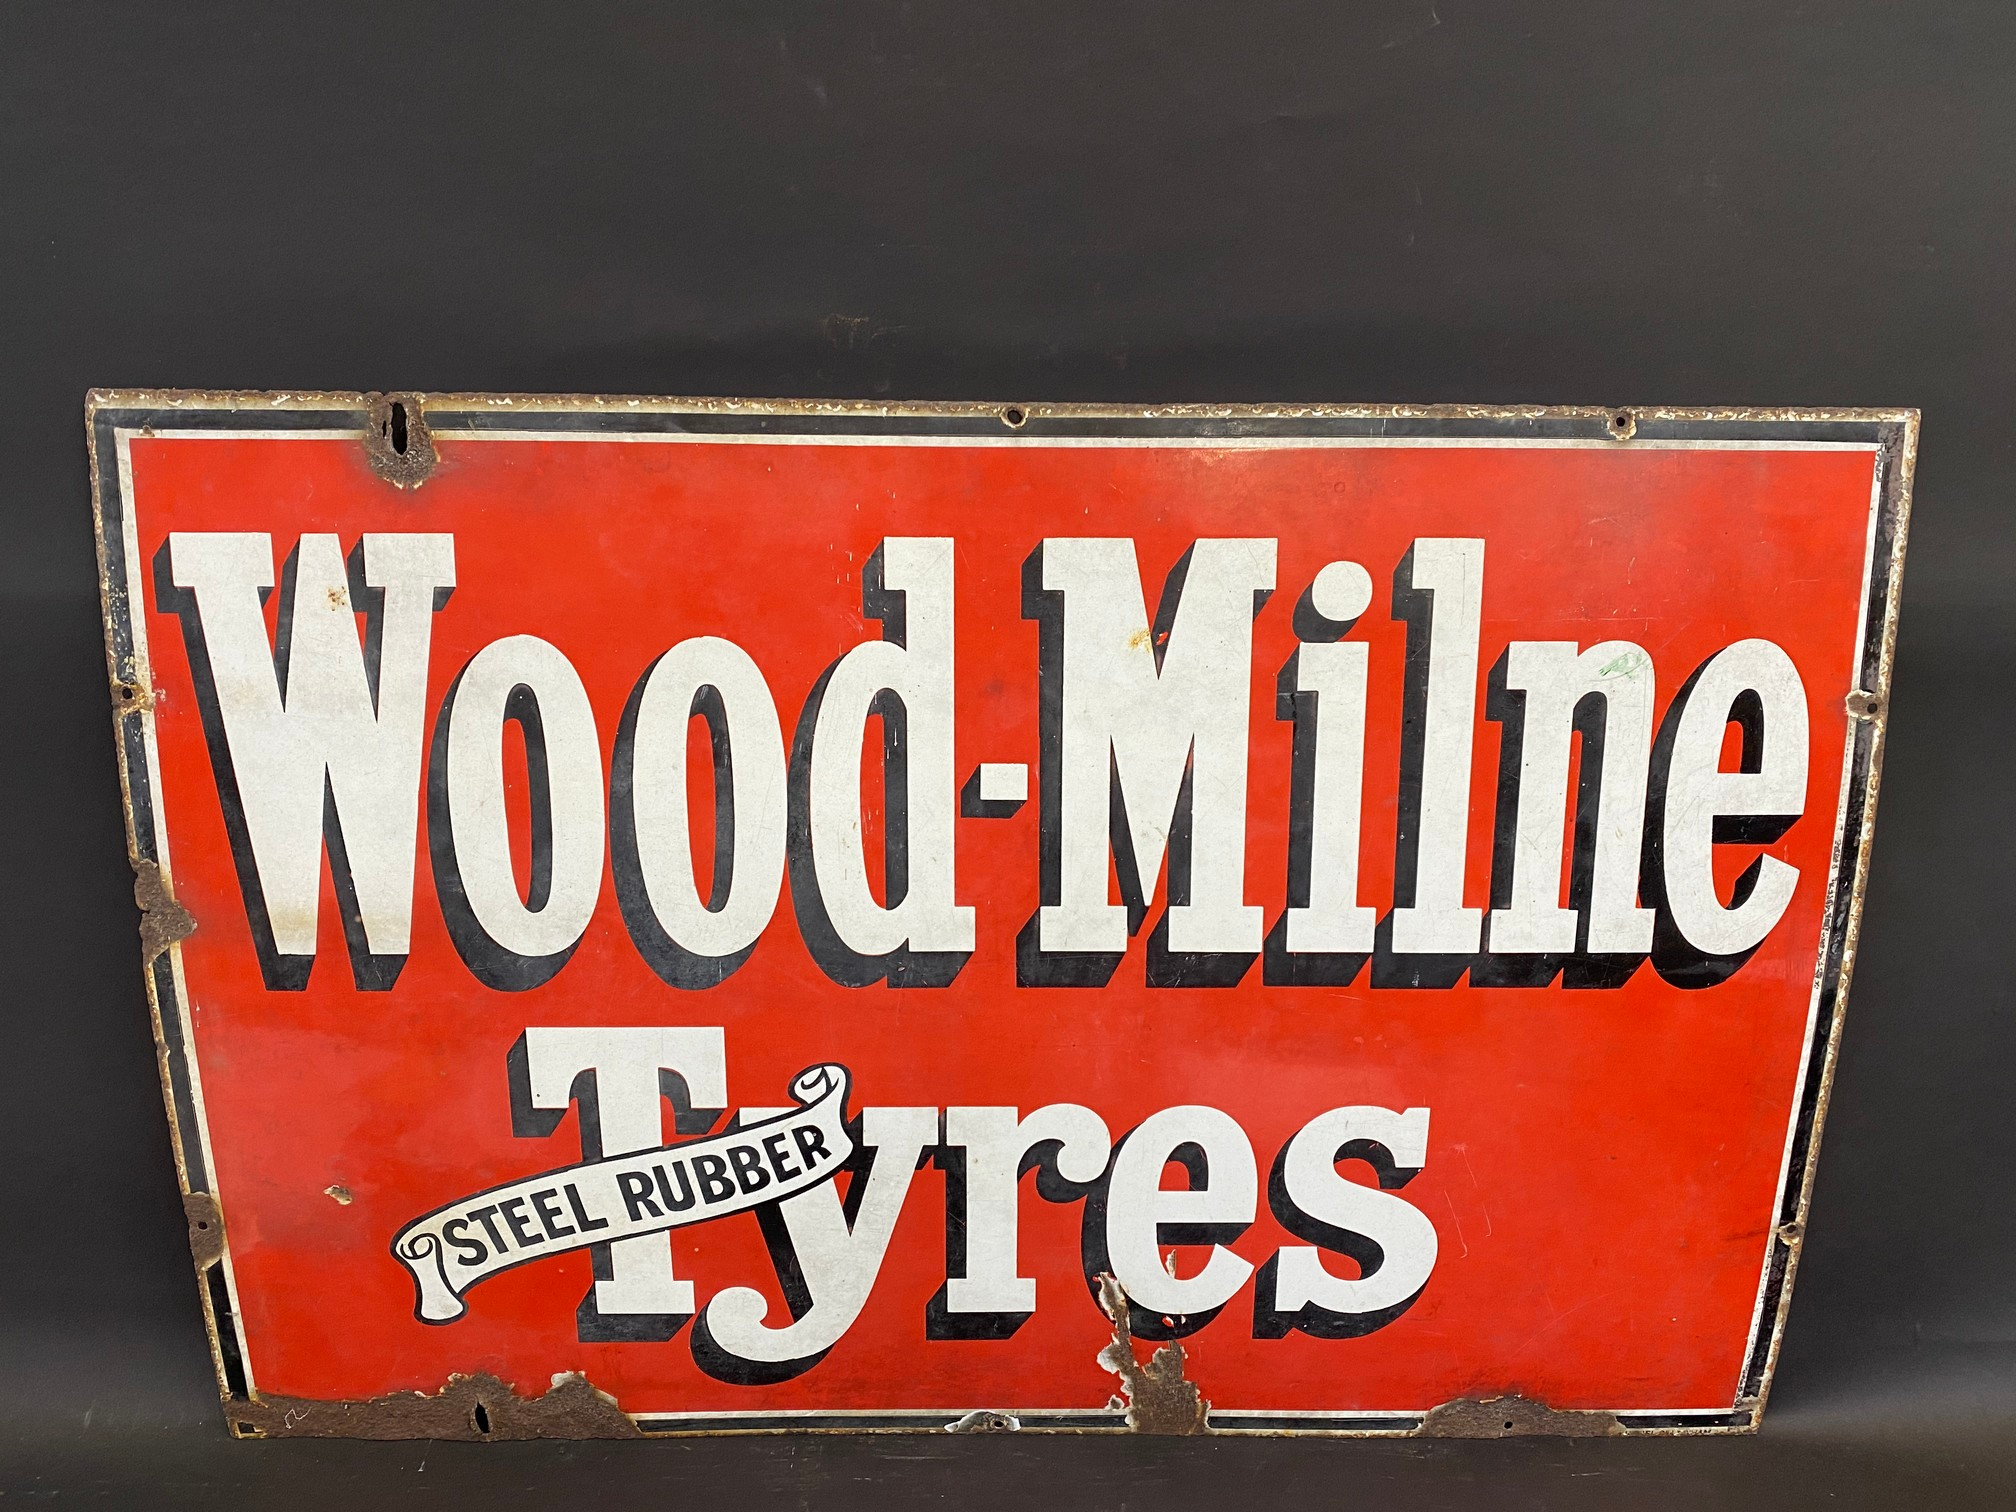 "A Wood-Milne Tyres rectangular enamel sign, 36 x 24""."